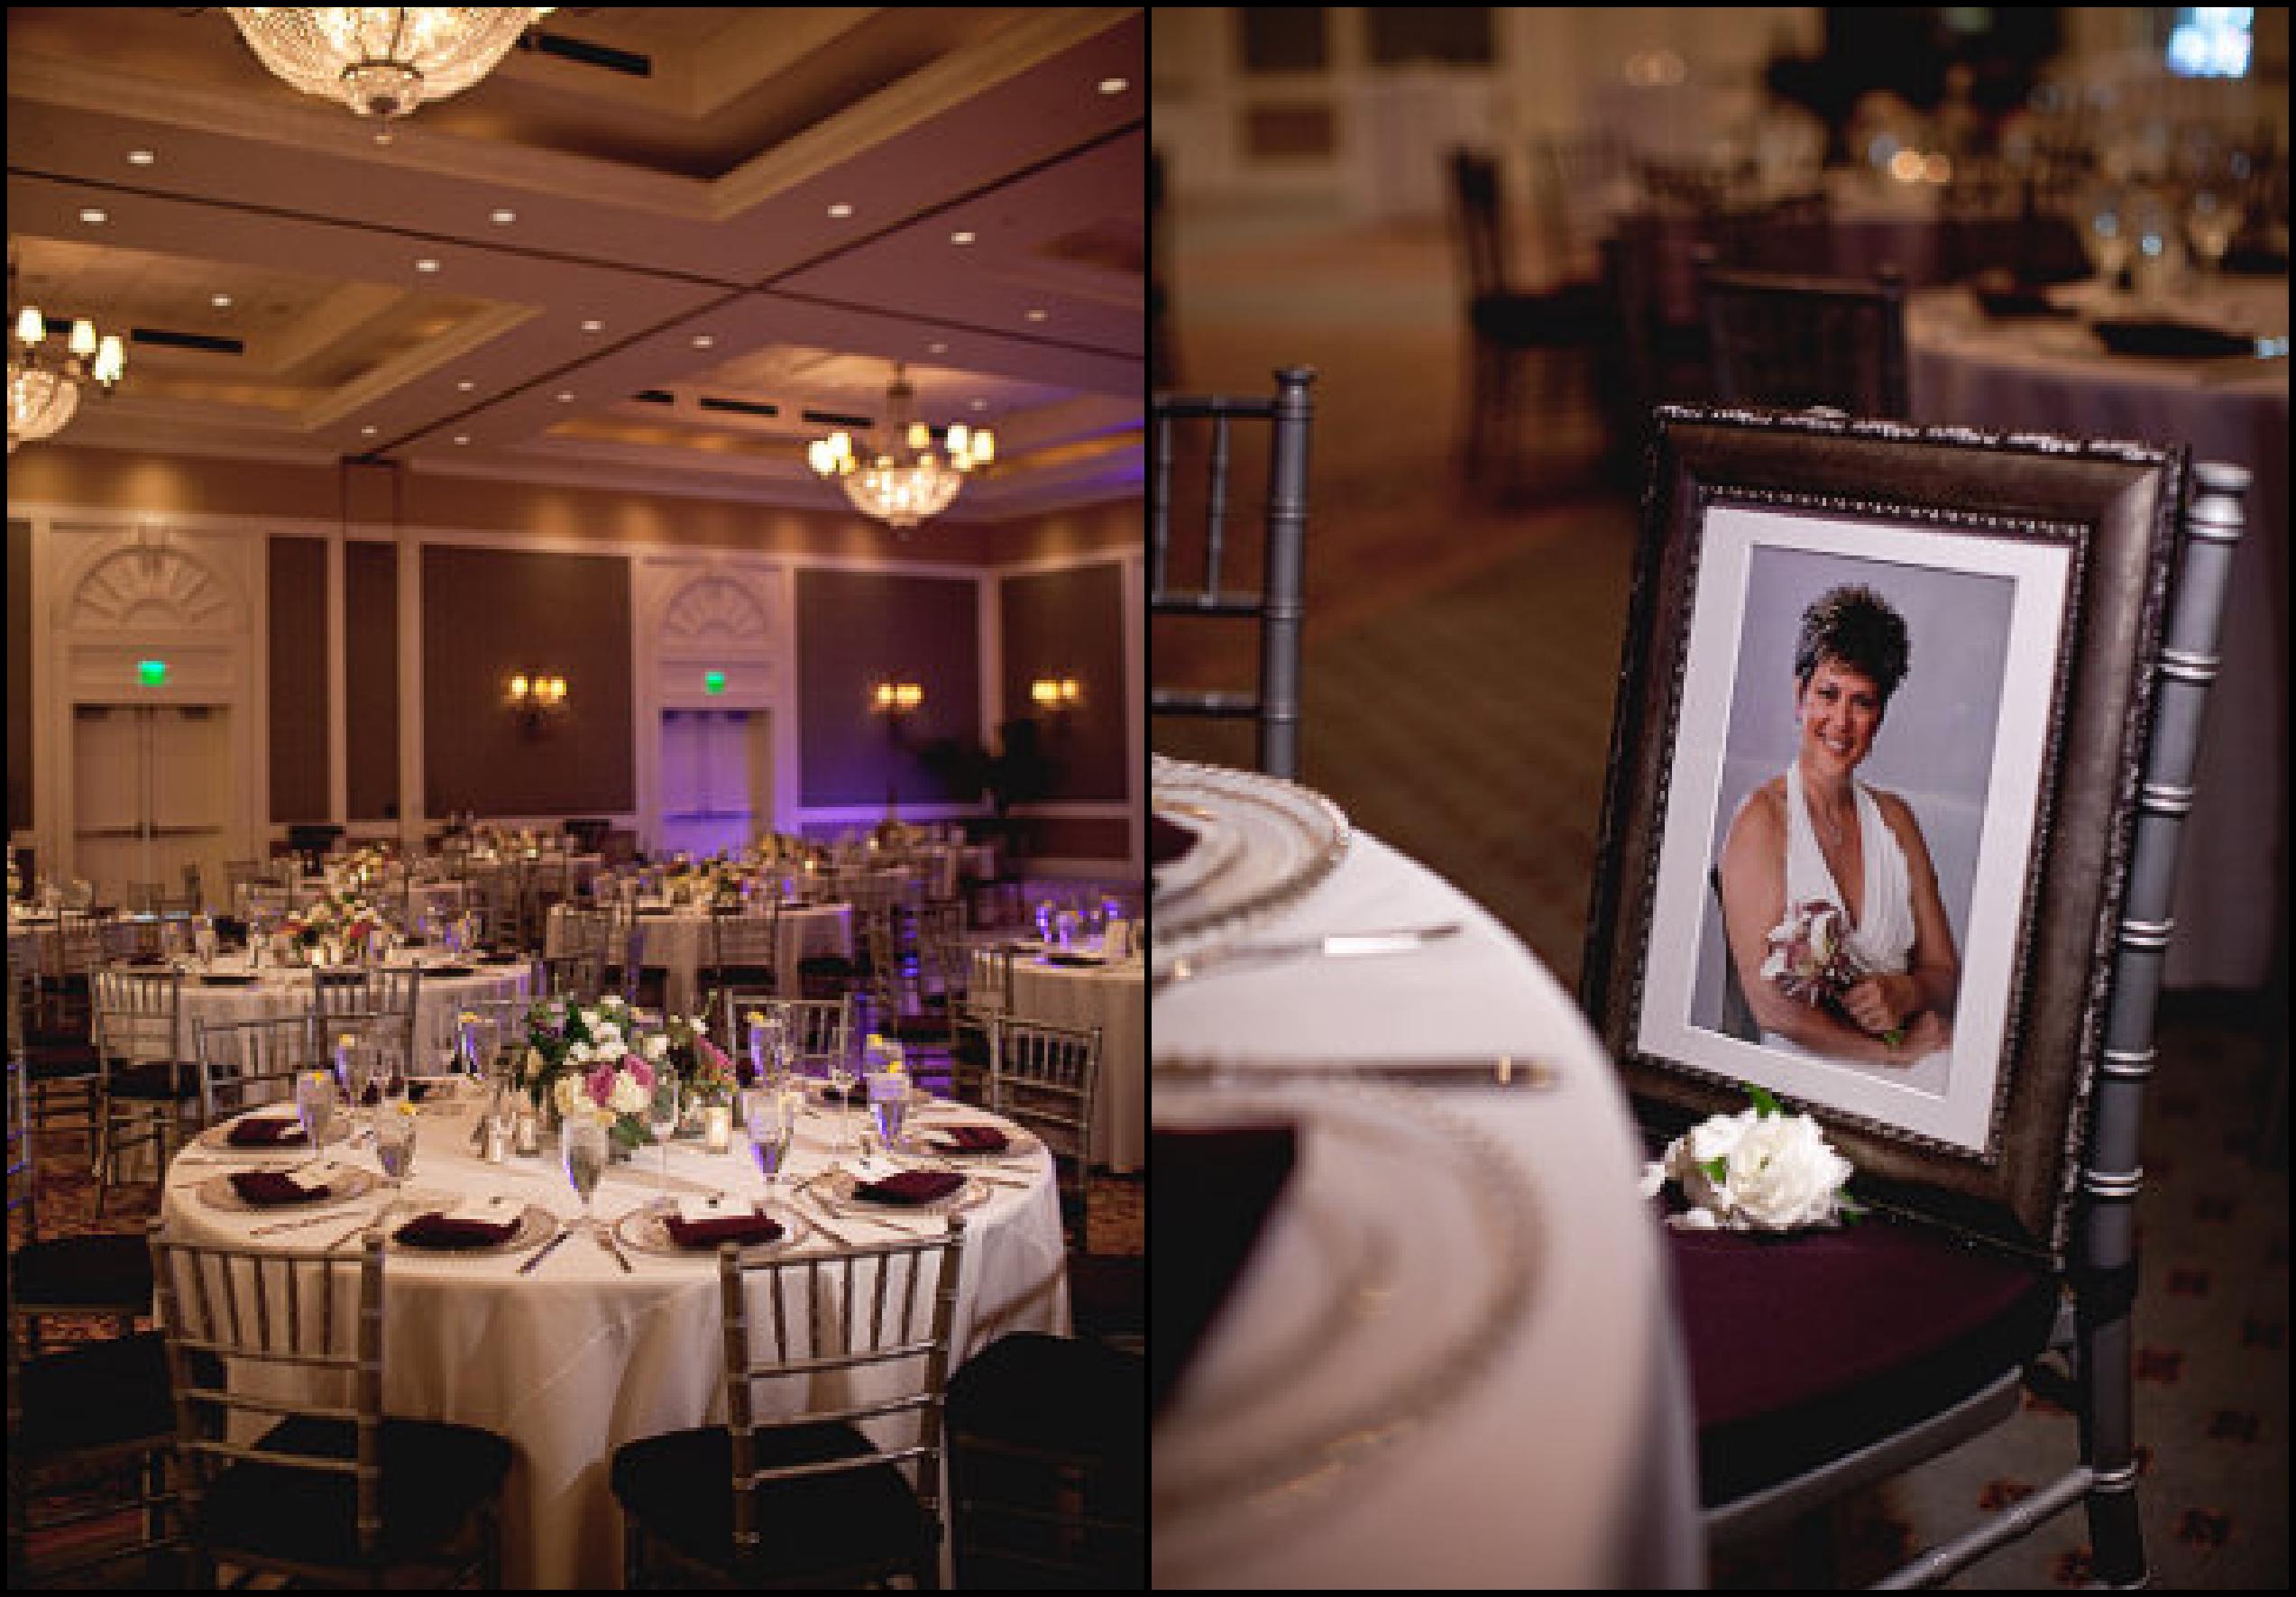 Unique In Memorial Wedding Ideas Orlando Weddings A Chair Affair Blog La Dolce Vita Photography